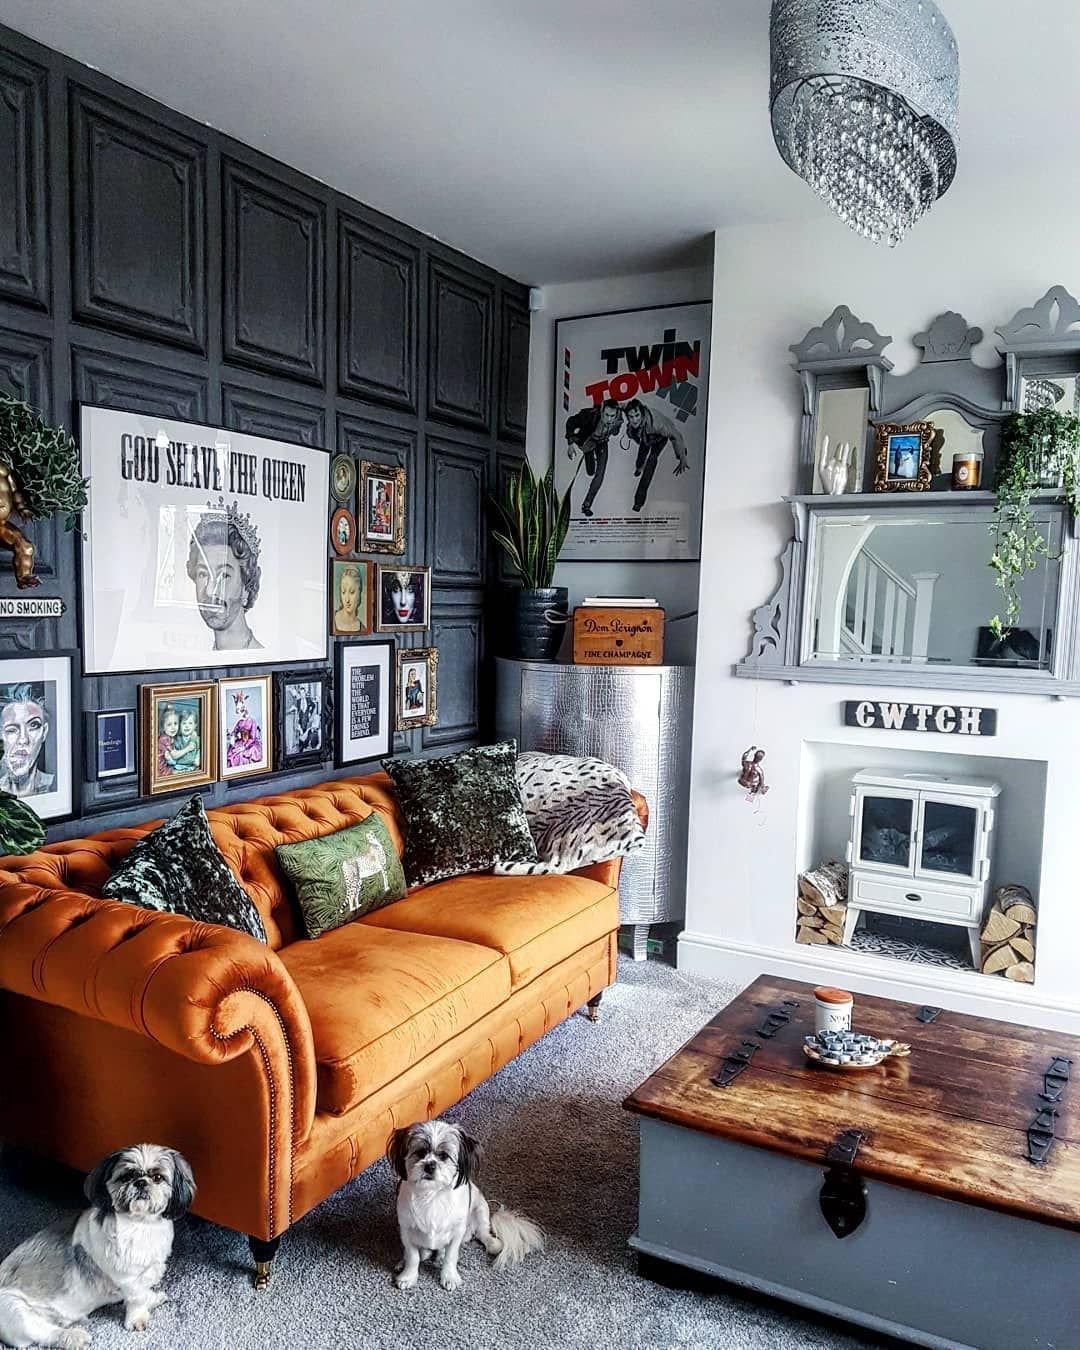 Burnt orange Living Room Decor What An Amazing Living Room Love the Burnt orange sofa